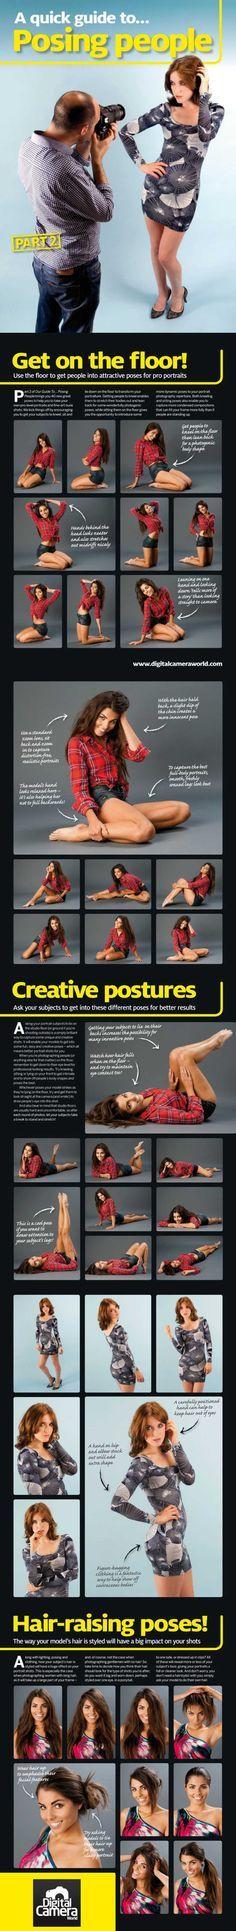 40 More Portrait Photography Ideas | Infographic.